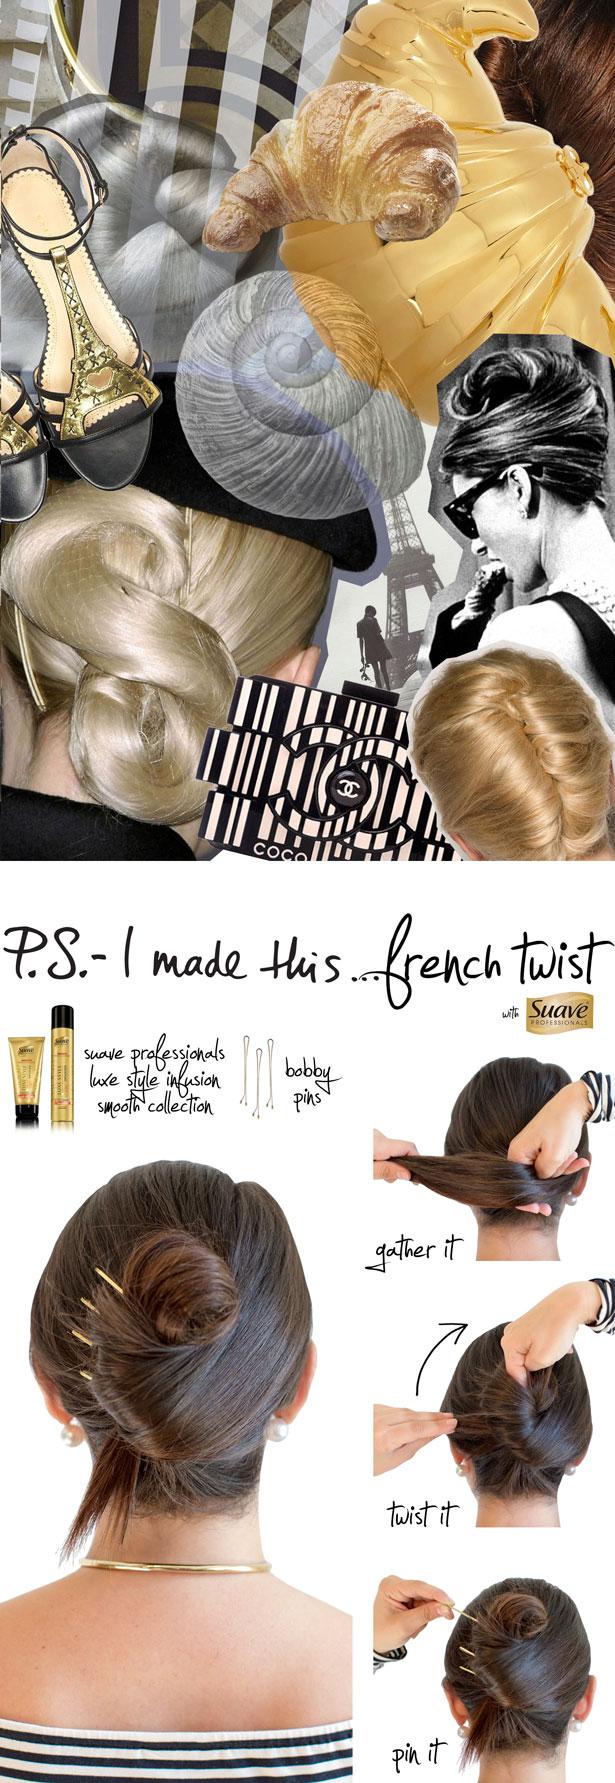 05.14.15_Suave_French-Twist